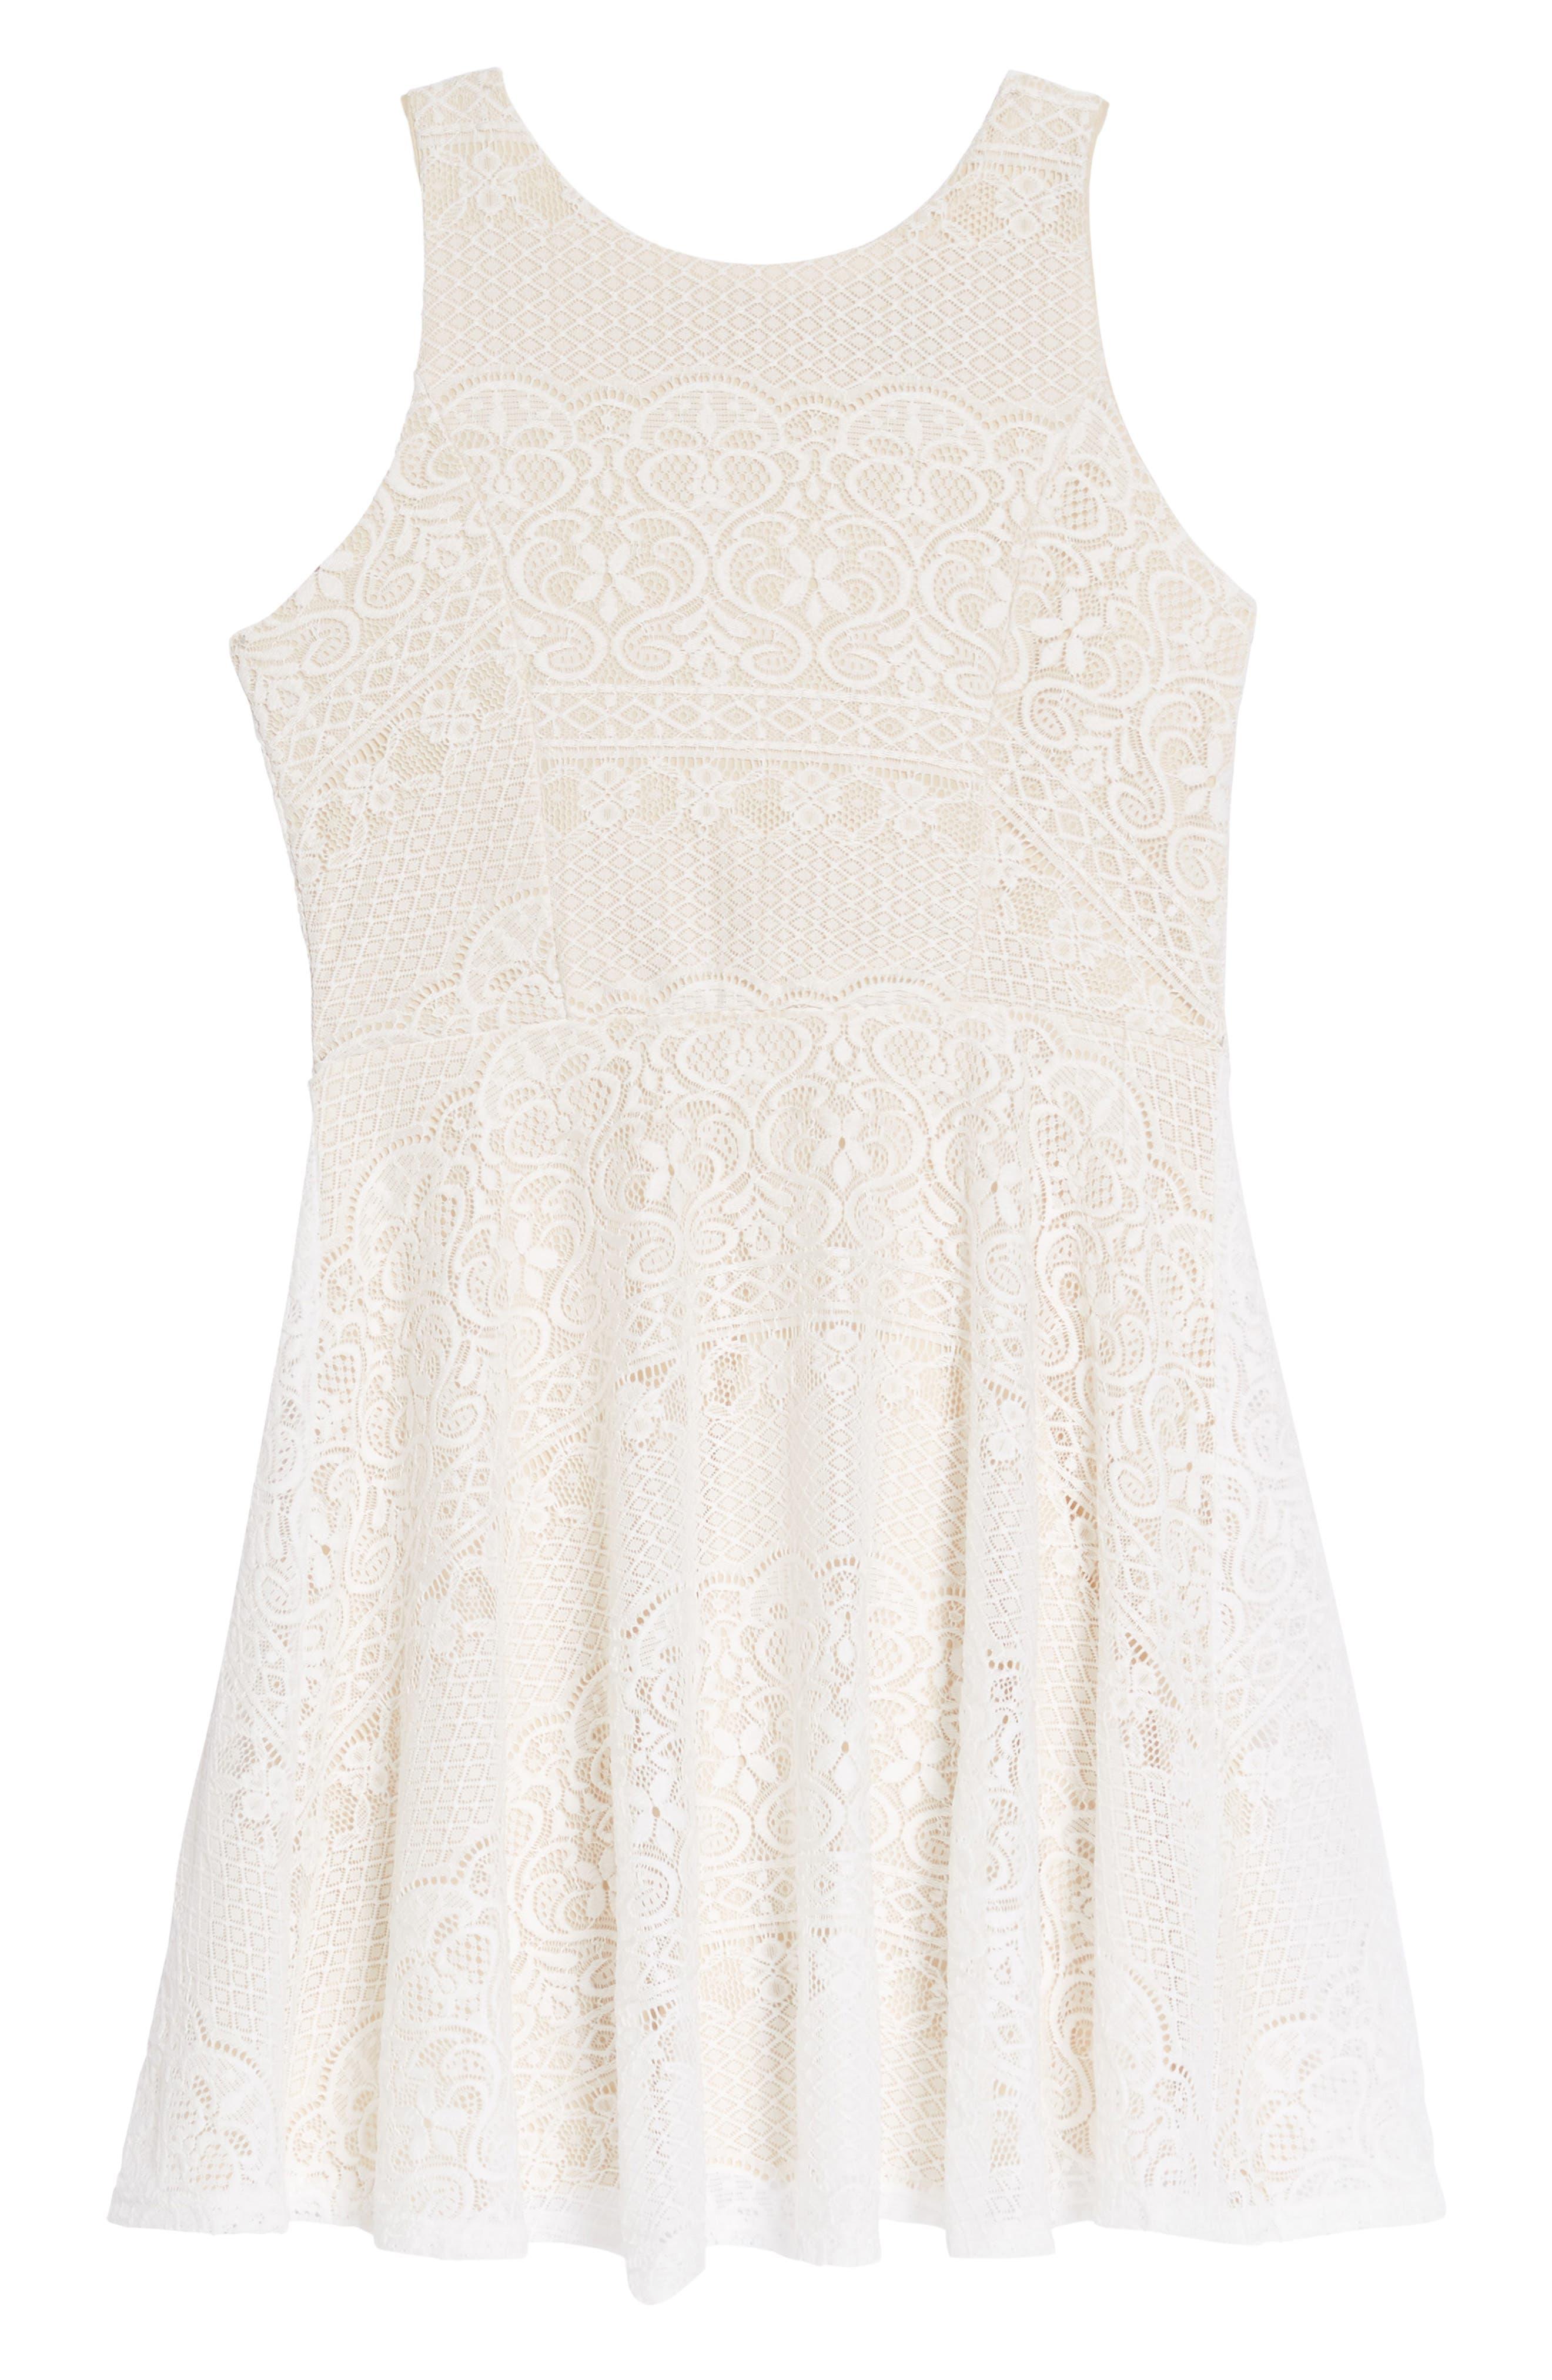 Rochelle Lace Skater Dress,                         Main,                         color, White